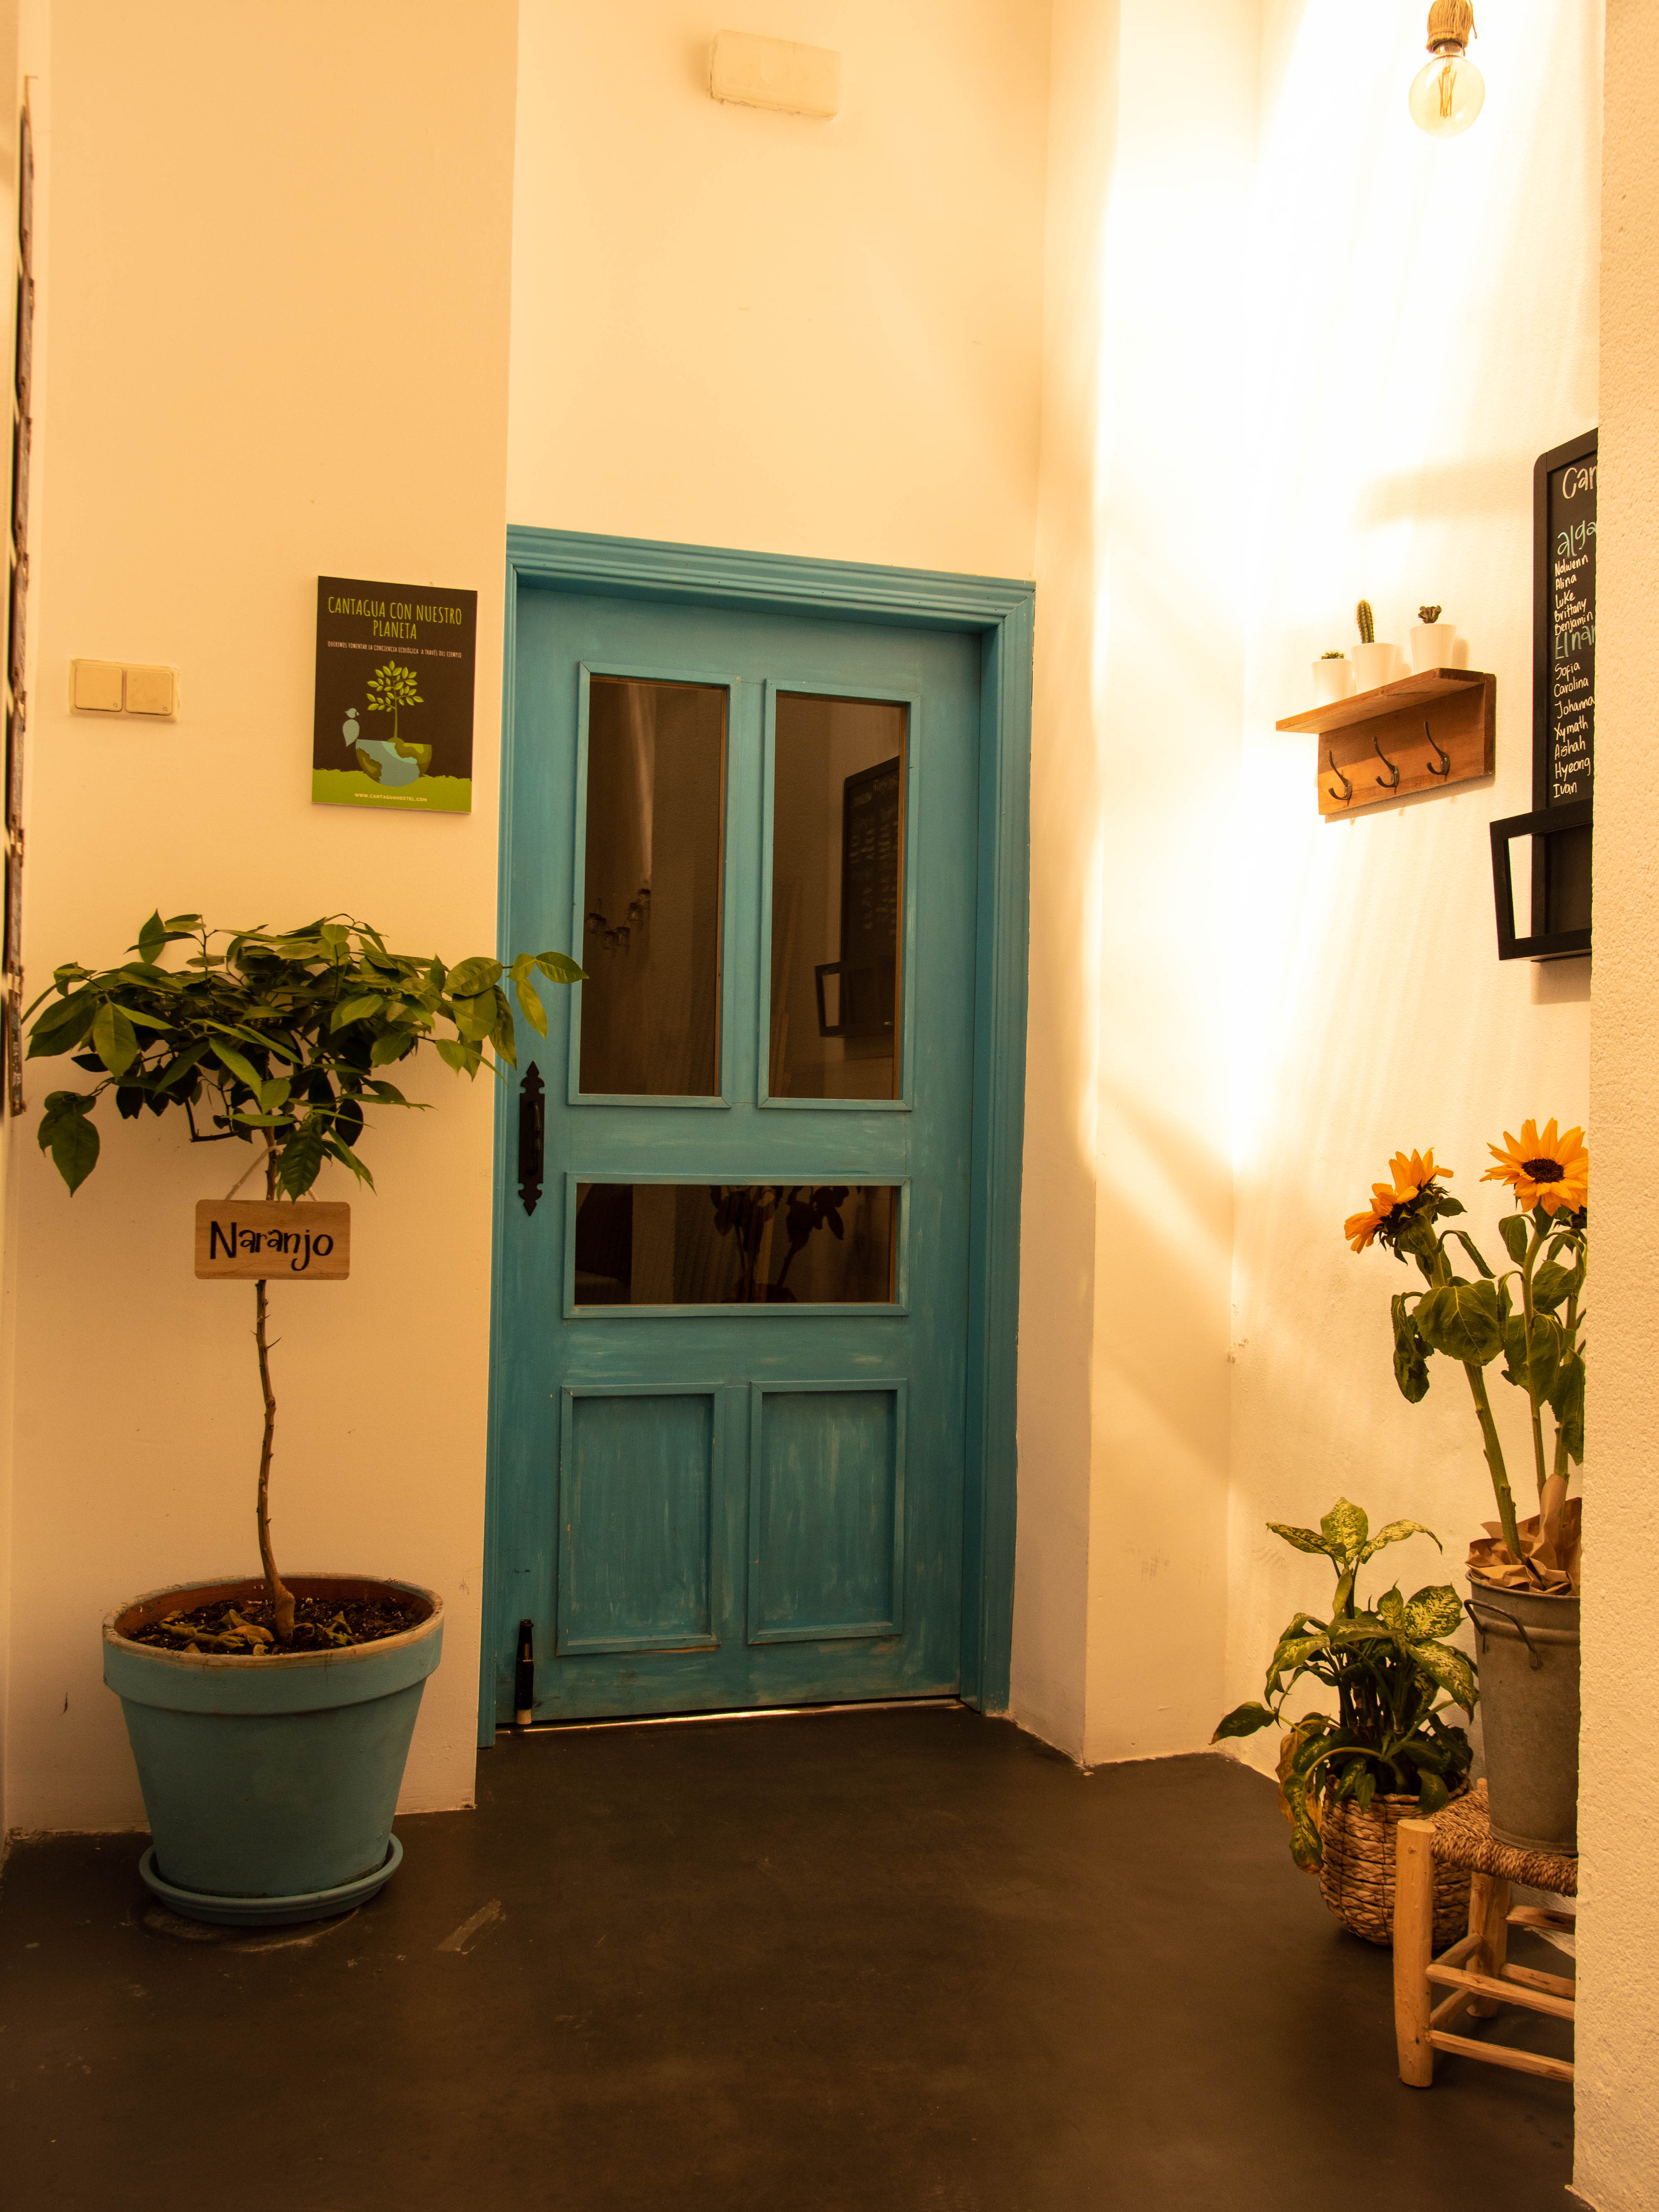 HOSTEL - Cantagua Hostel